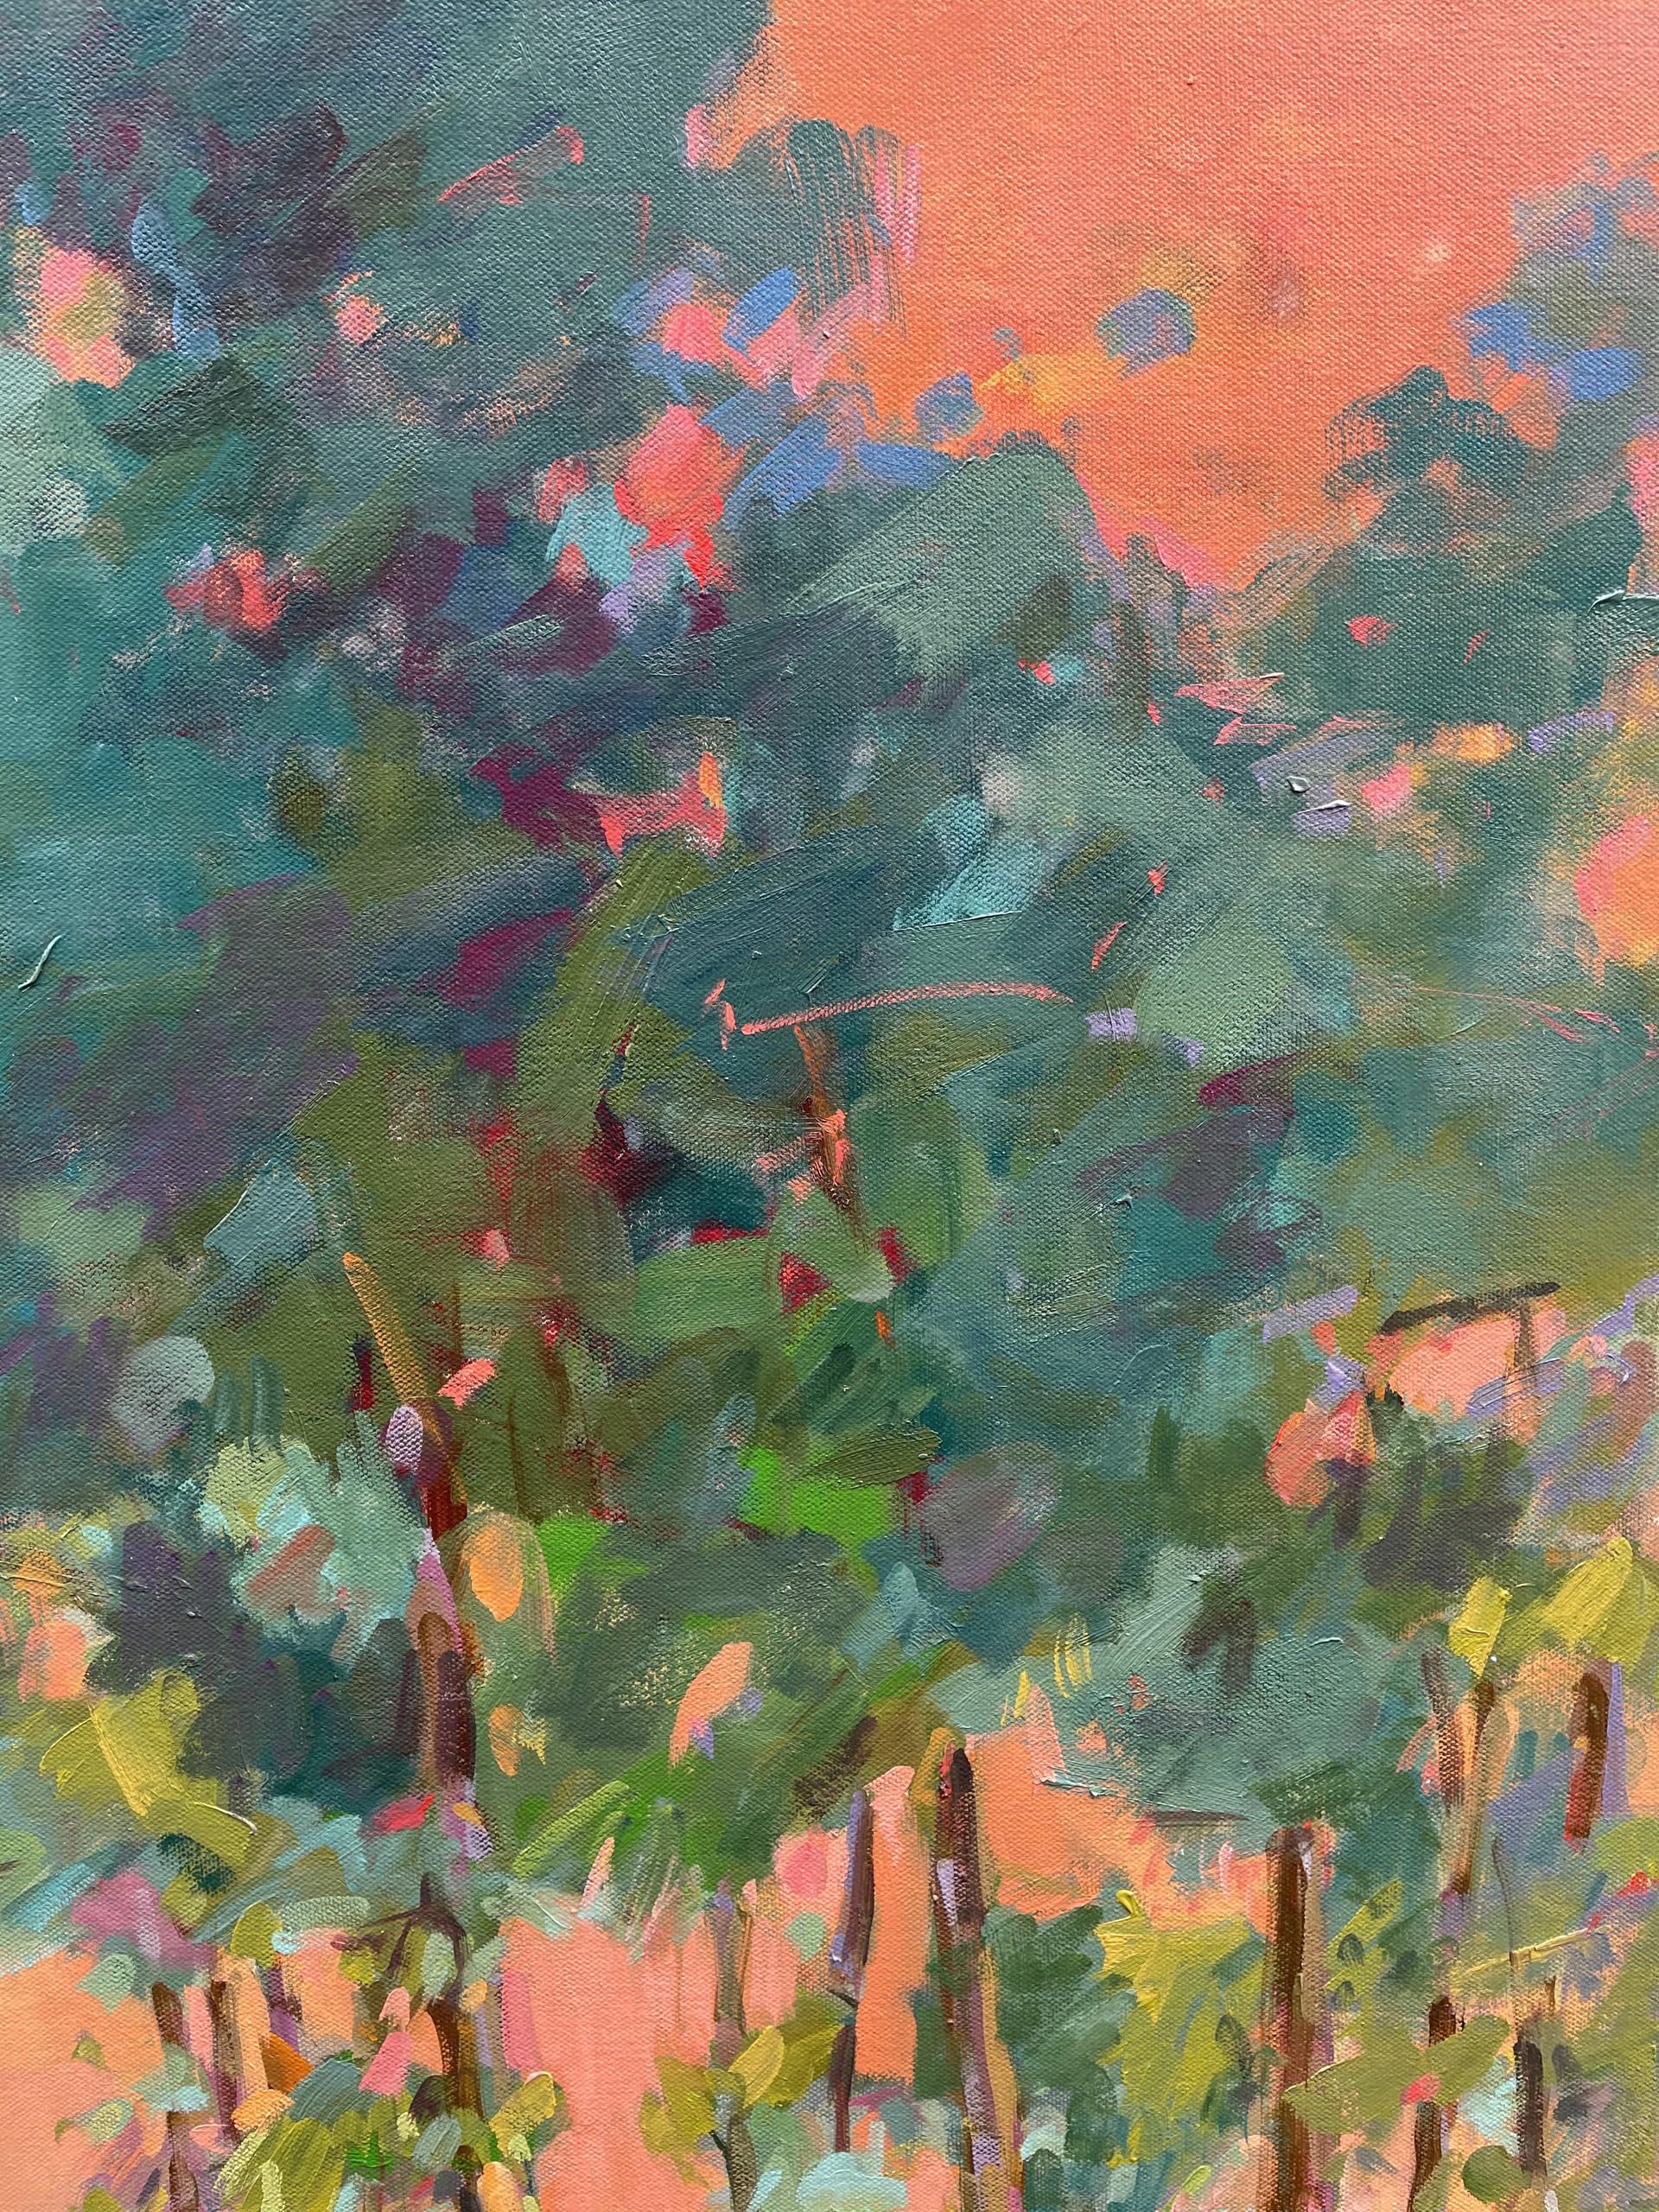 Hidden Treasure, II by Marissa Vogl